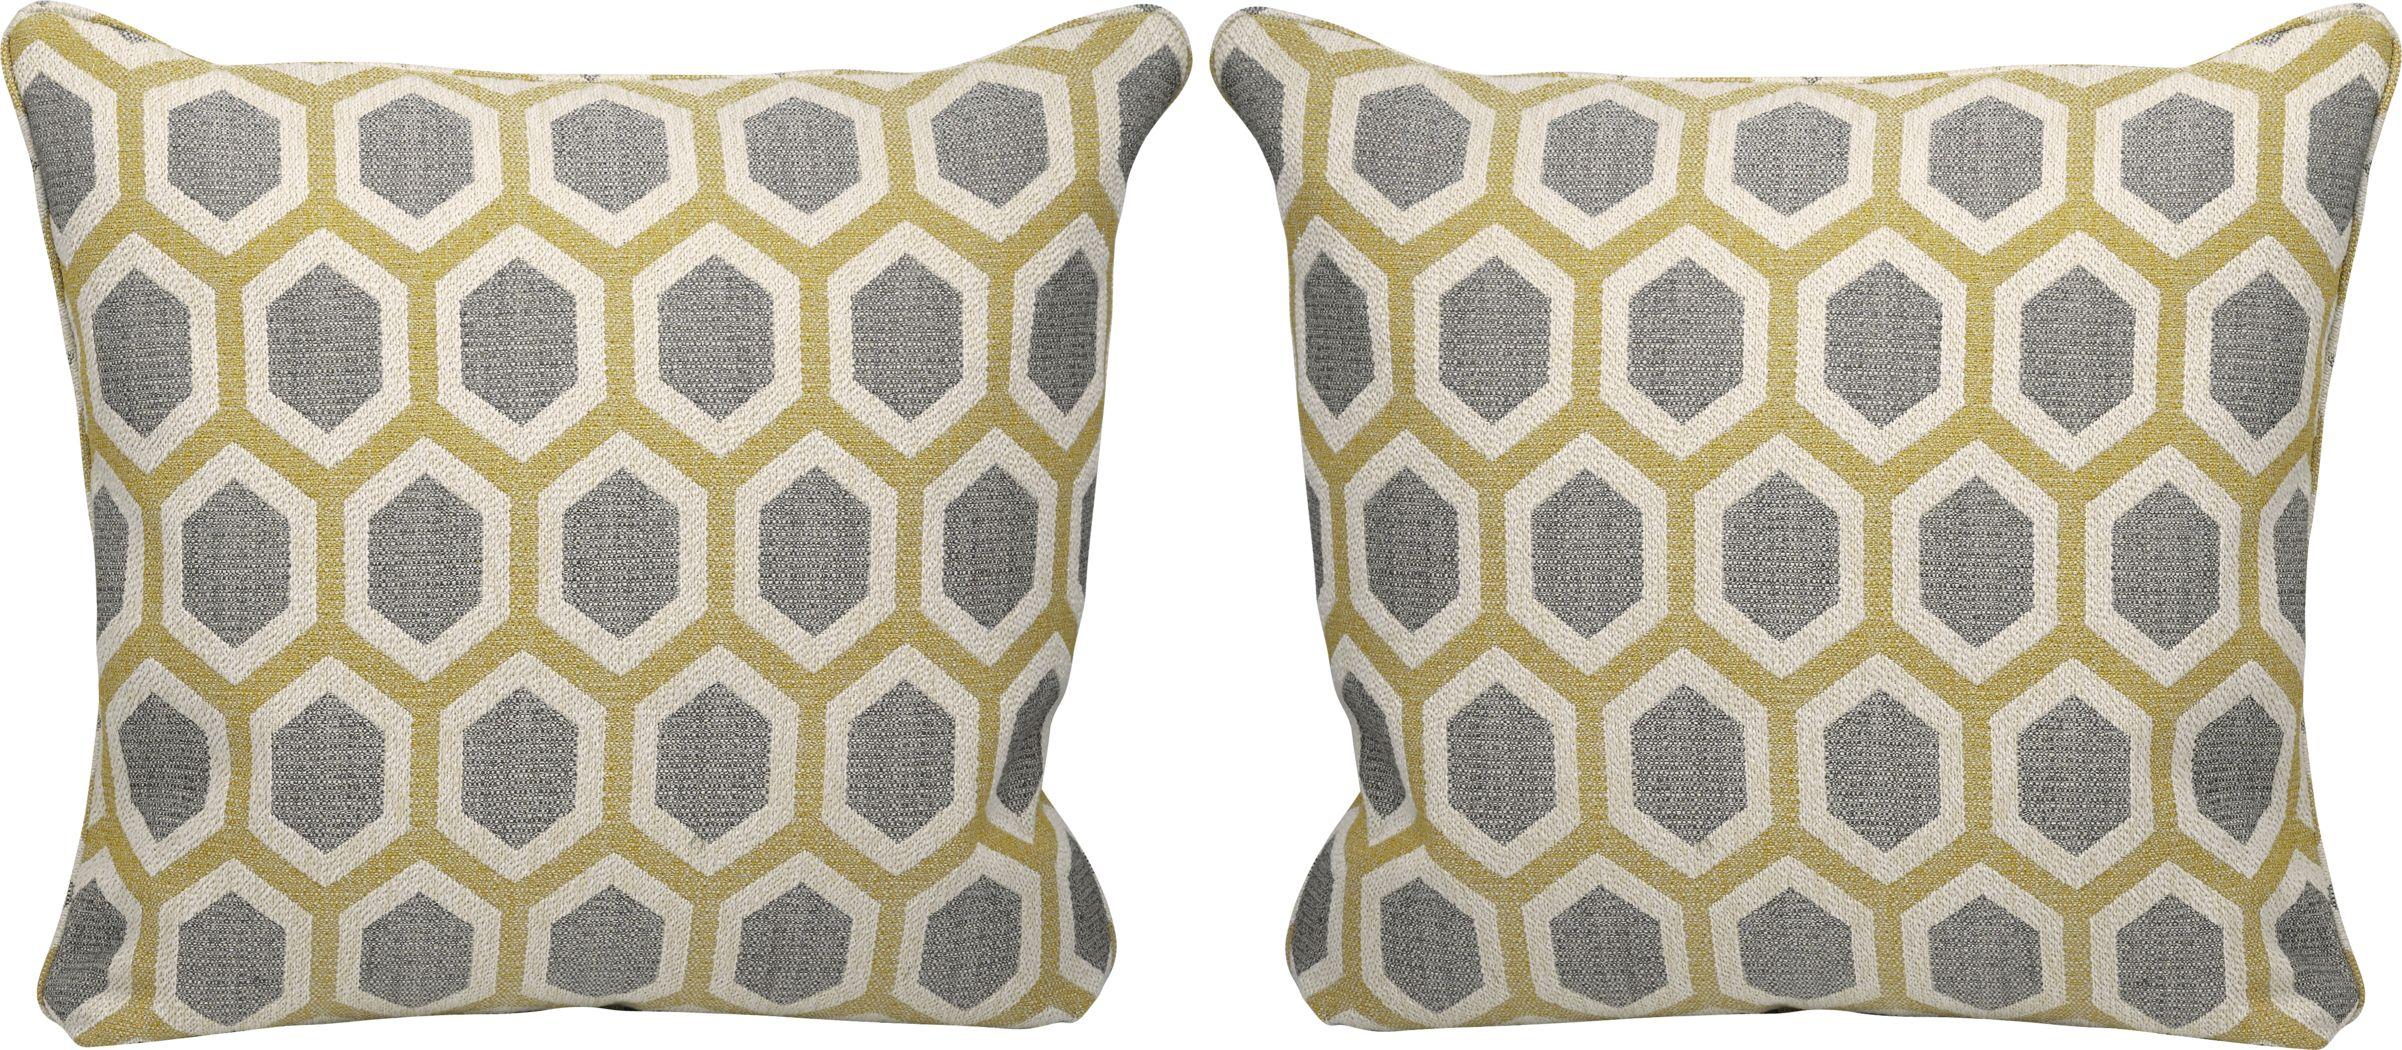 Lexie Maize Accent Pillows (Set of 2)